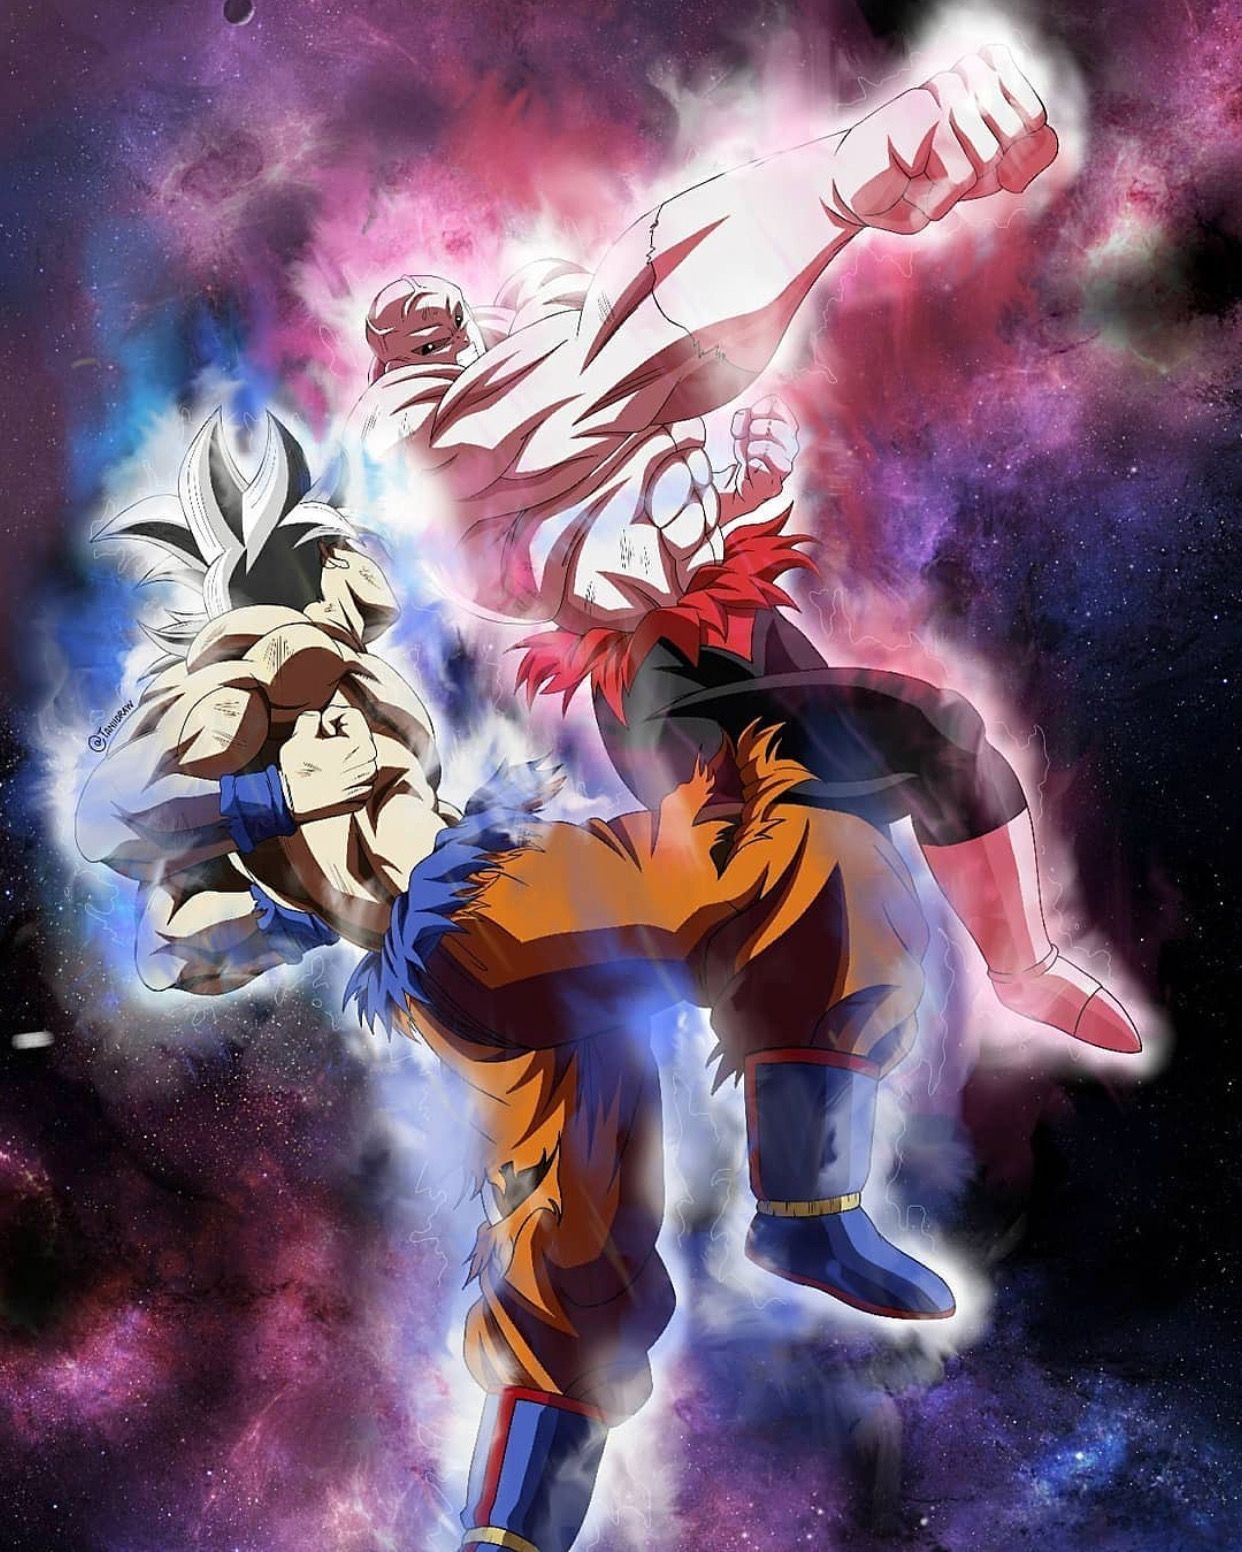 Dragon Ball Super Chapter 70 Release Date Where You Can Read It Dragon Ball Anime Dragon Ball Super Anime Dragon Ball